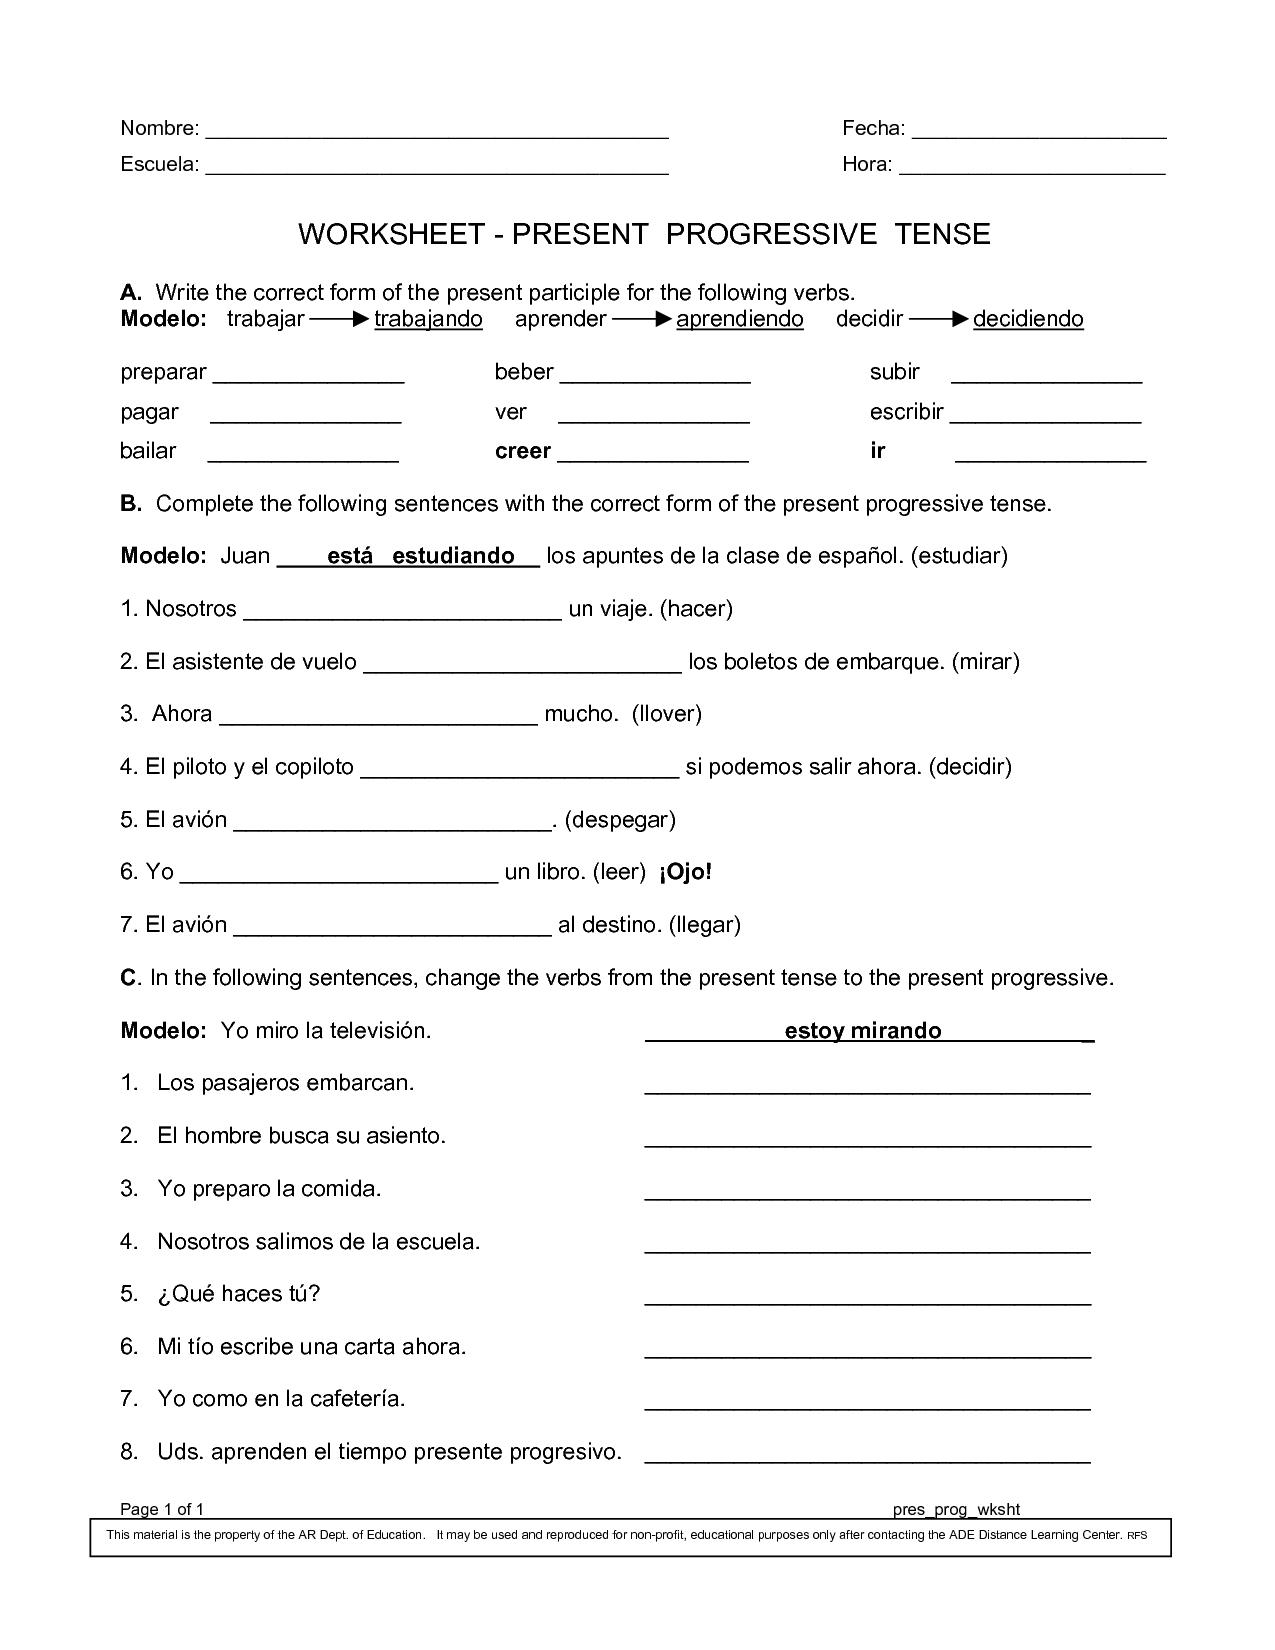 Spanish Worksheets Printables | Present Progressive Worksheet | Spanish Reflexive Verbs Worksheet Printable